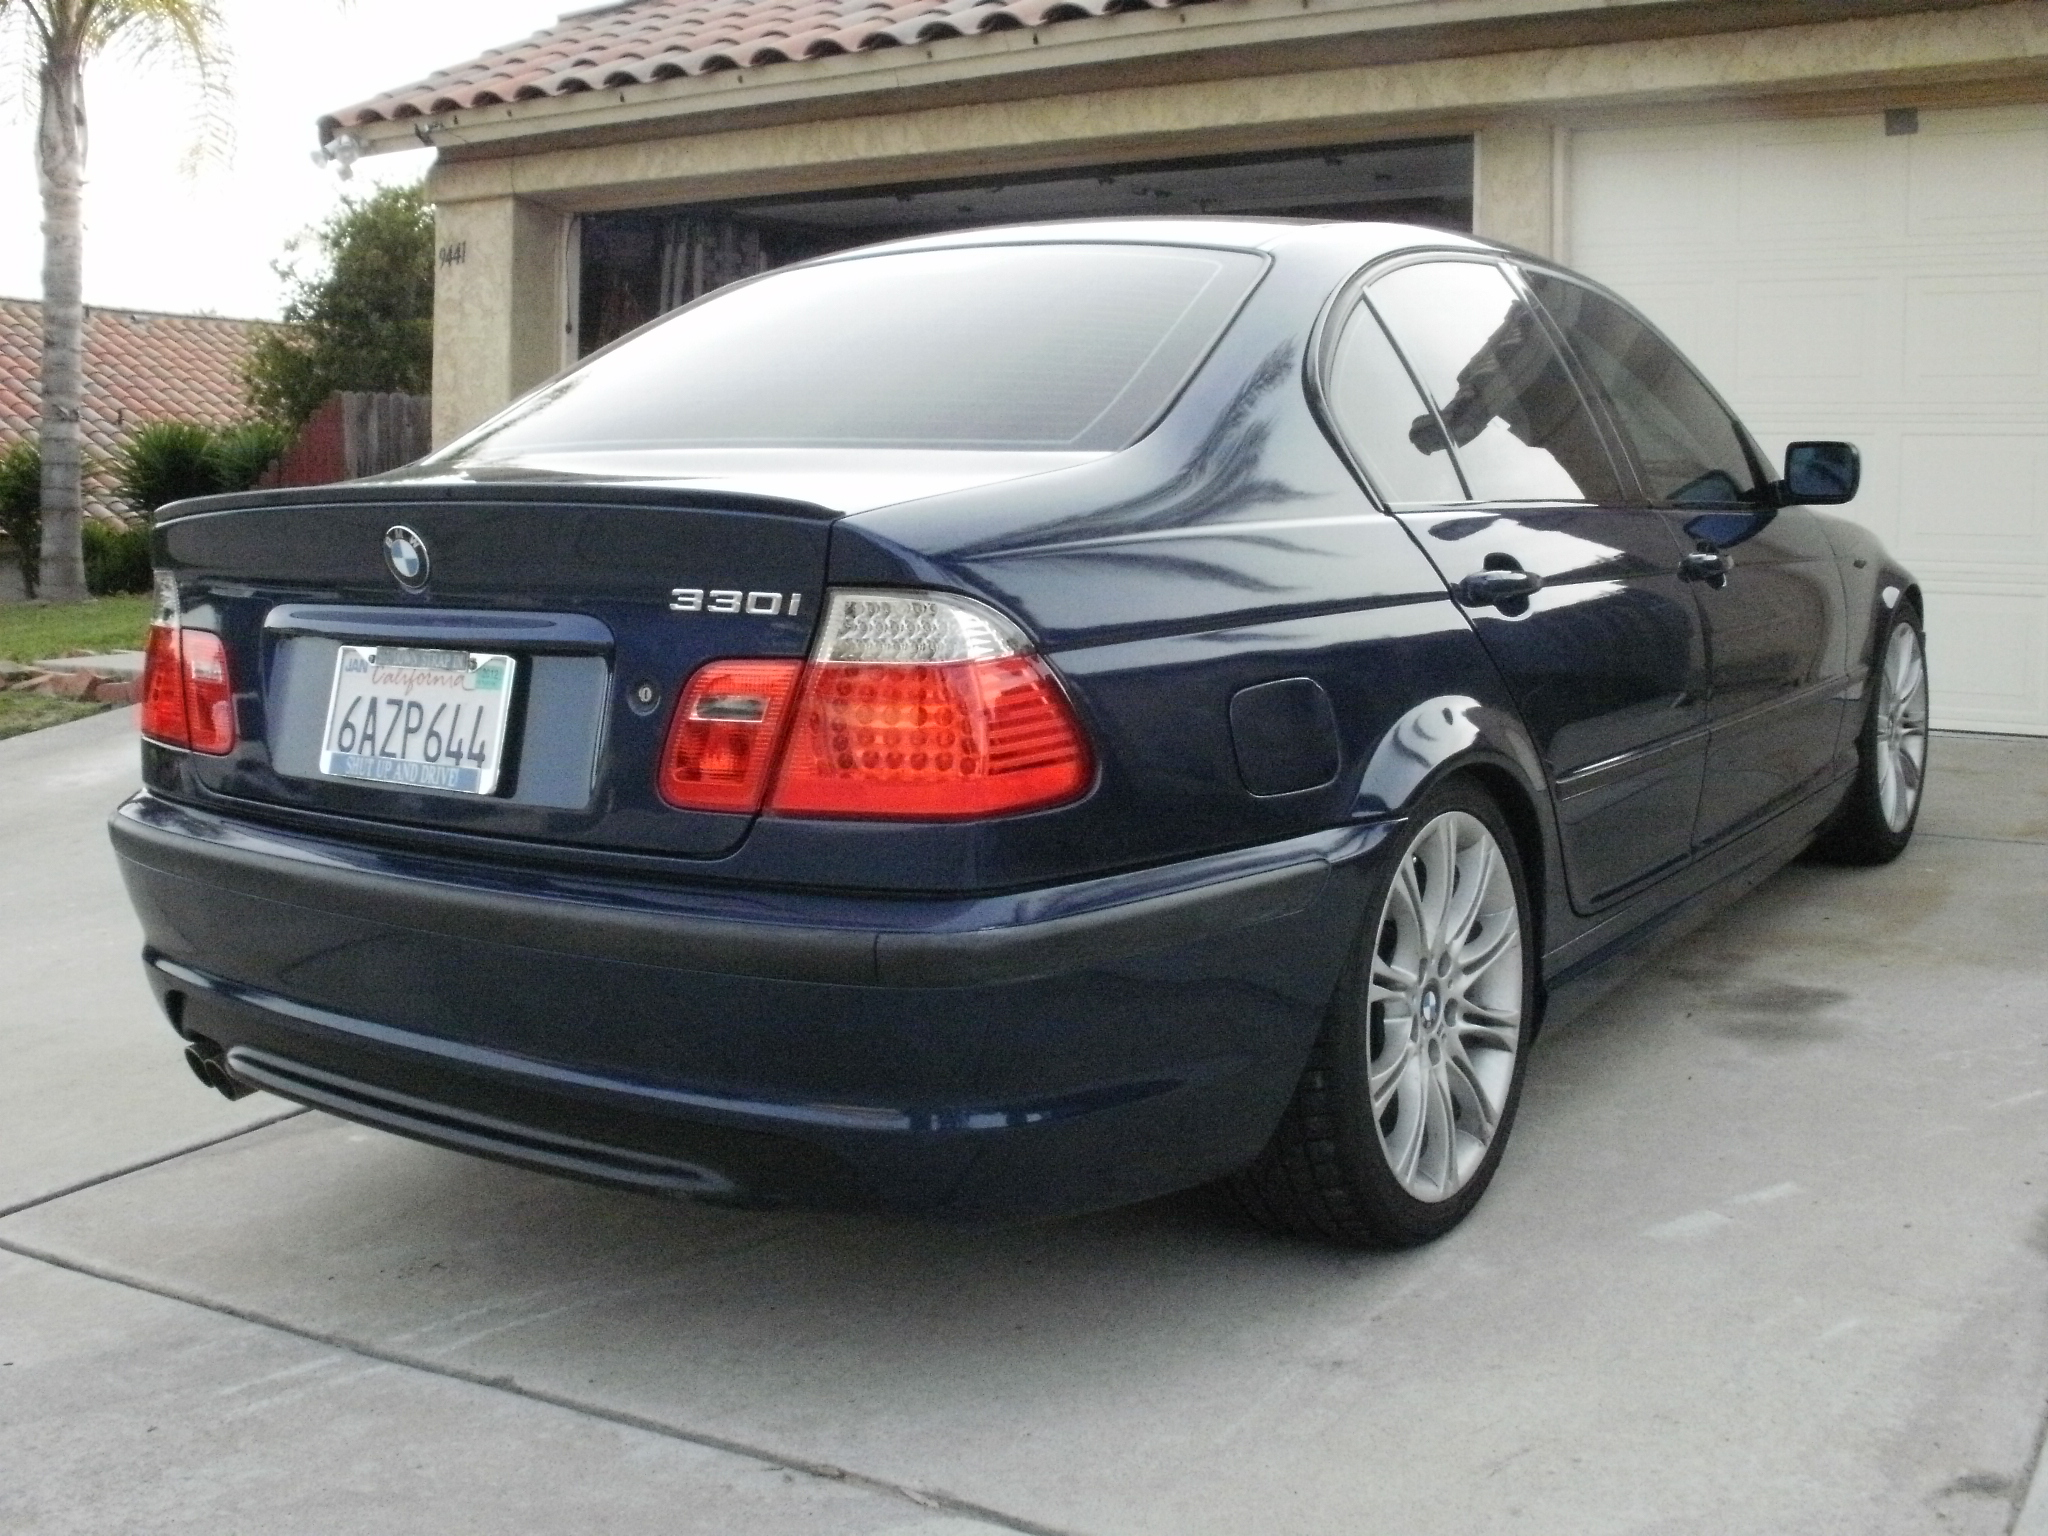 Bmw Of San Diego >> FS: Eagle Eyes LED Tail Lights for Sedan